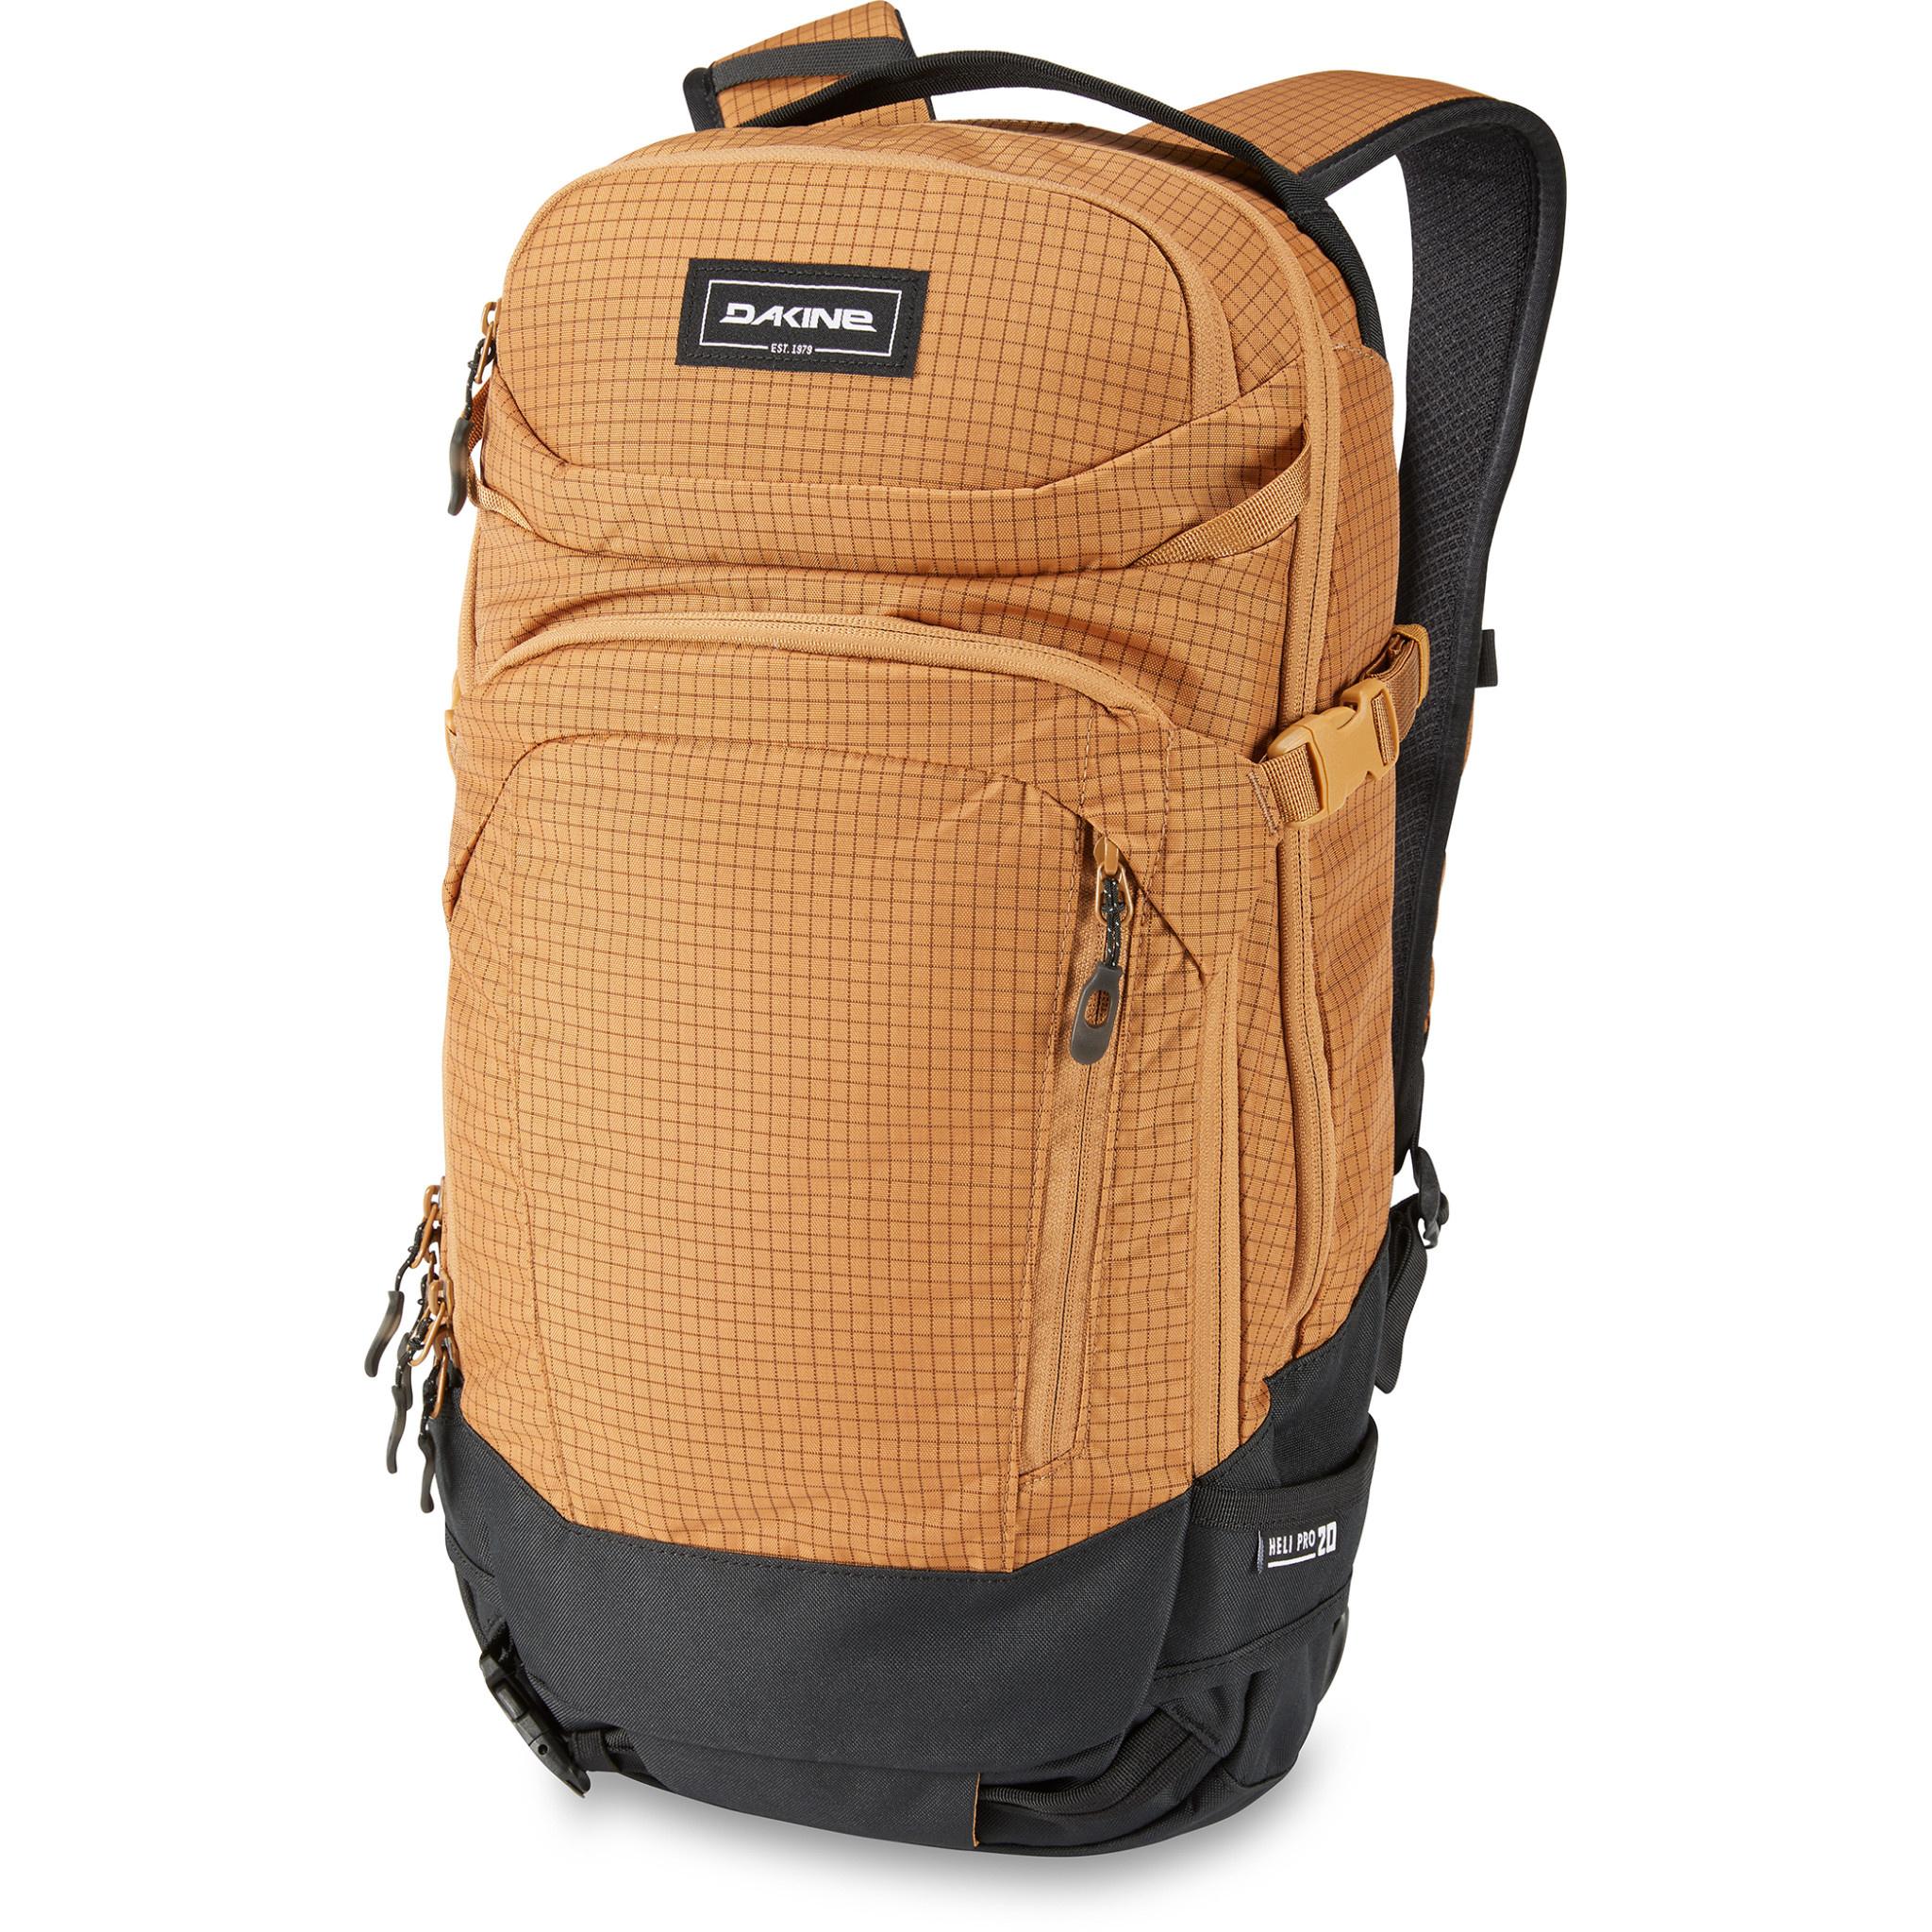 Dakine Dakine Heli Pro 20L Backpack